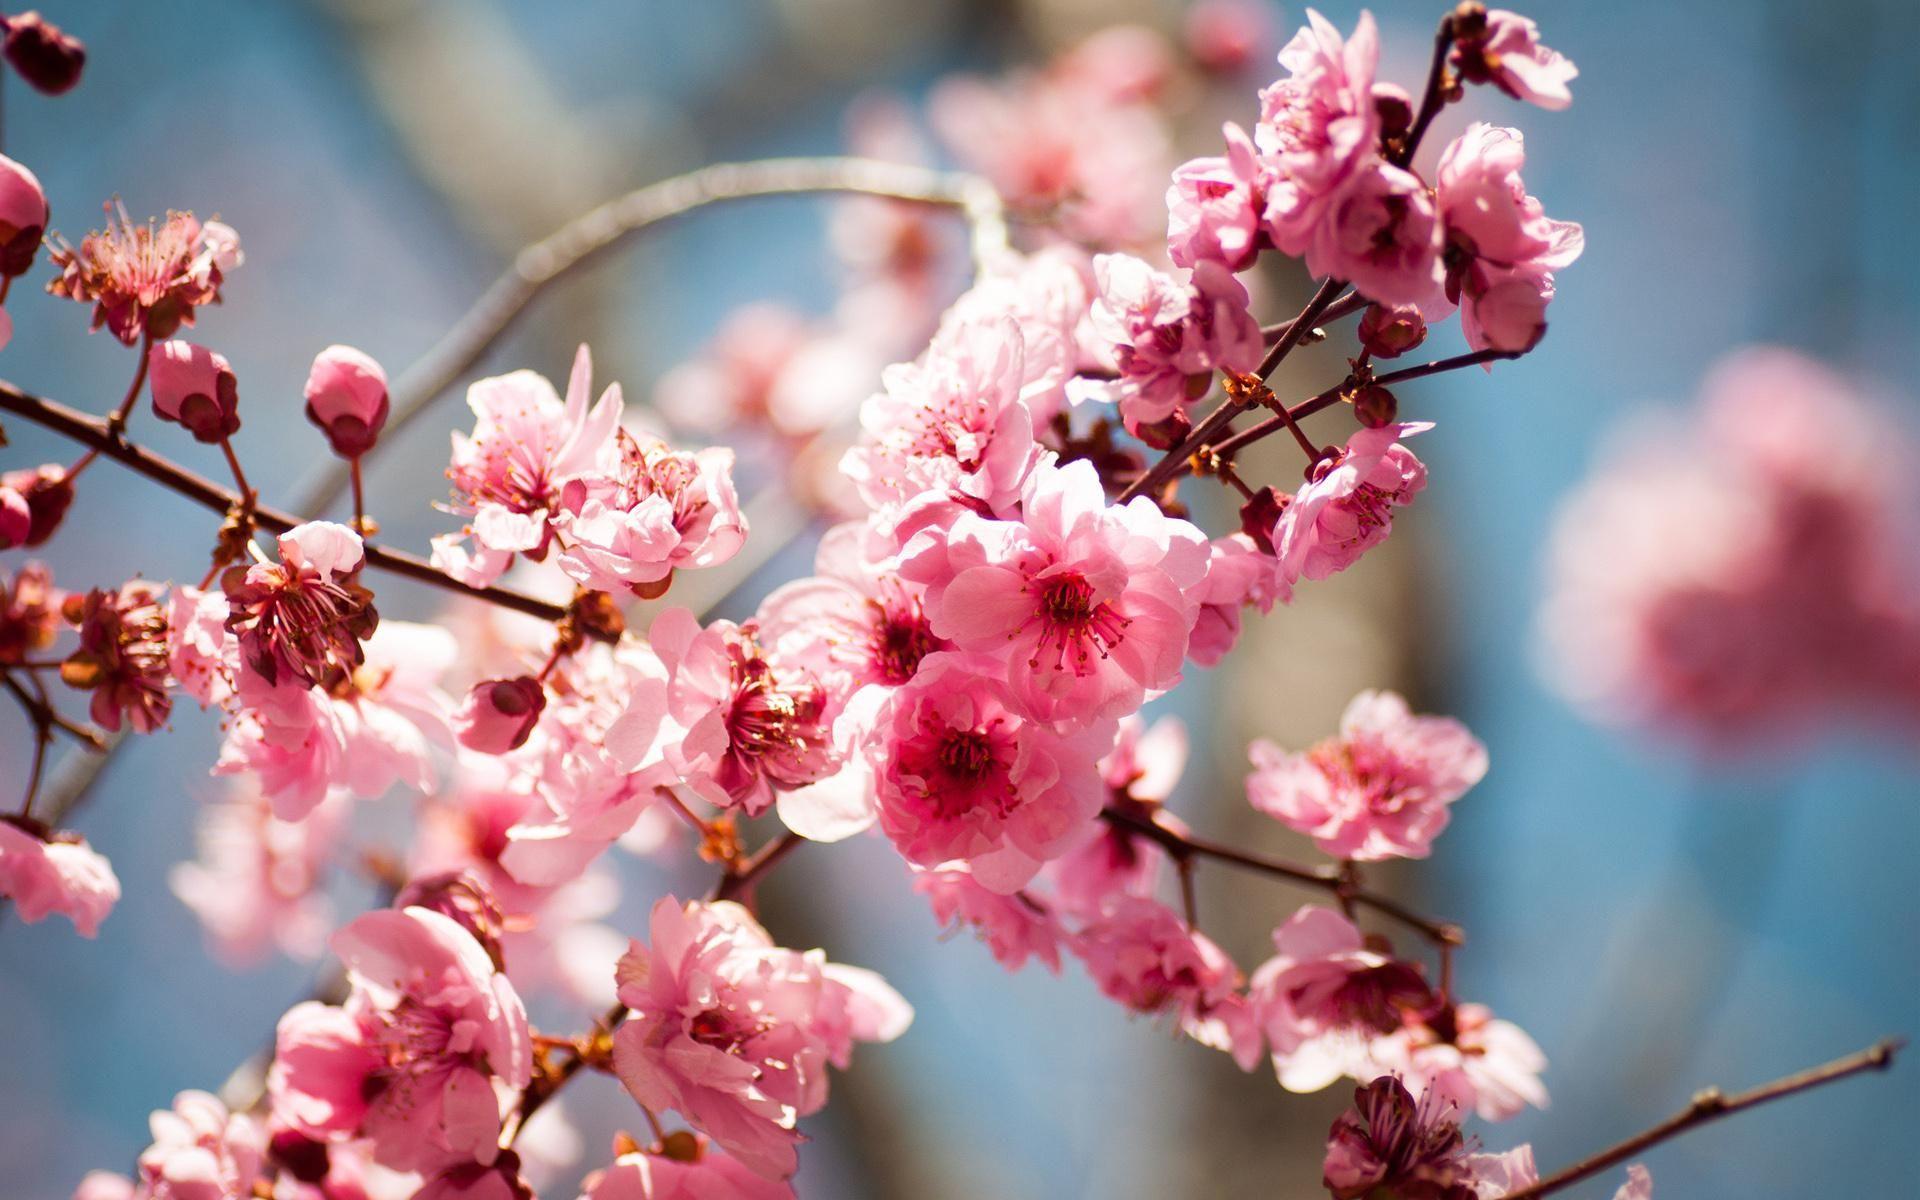 HD Bloom Spring Tree Flowers Blossoms HD 1080p Wallpaper | Gardens ...